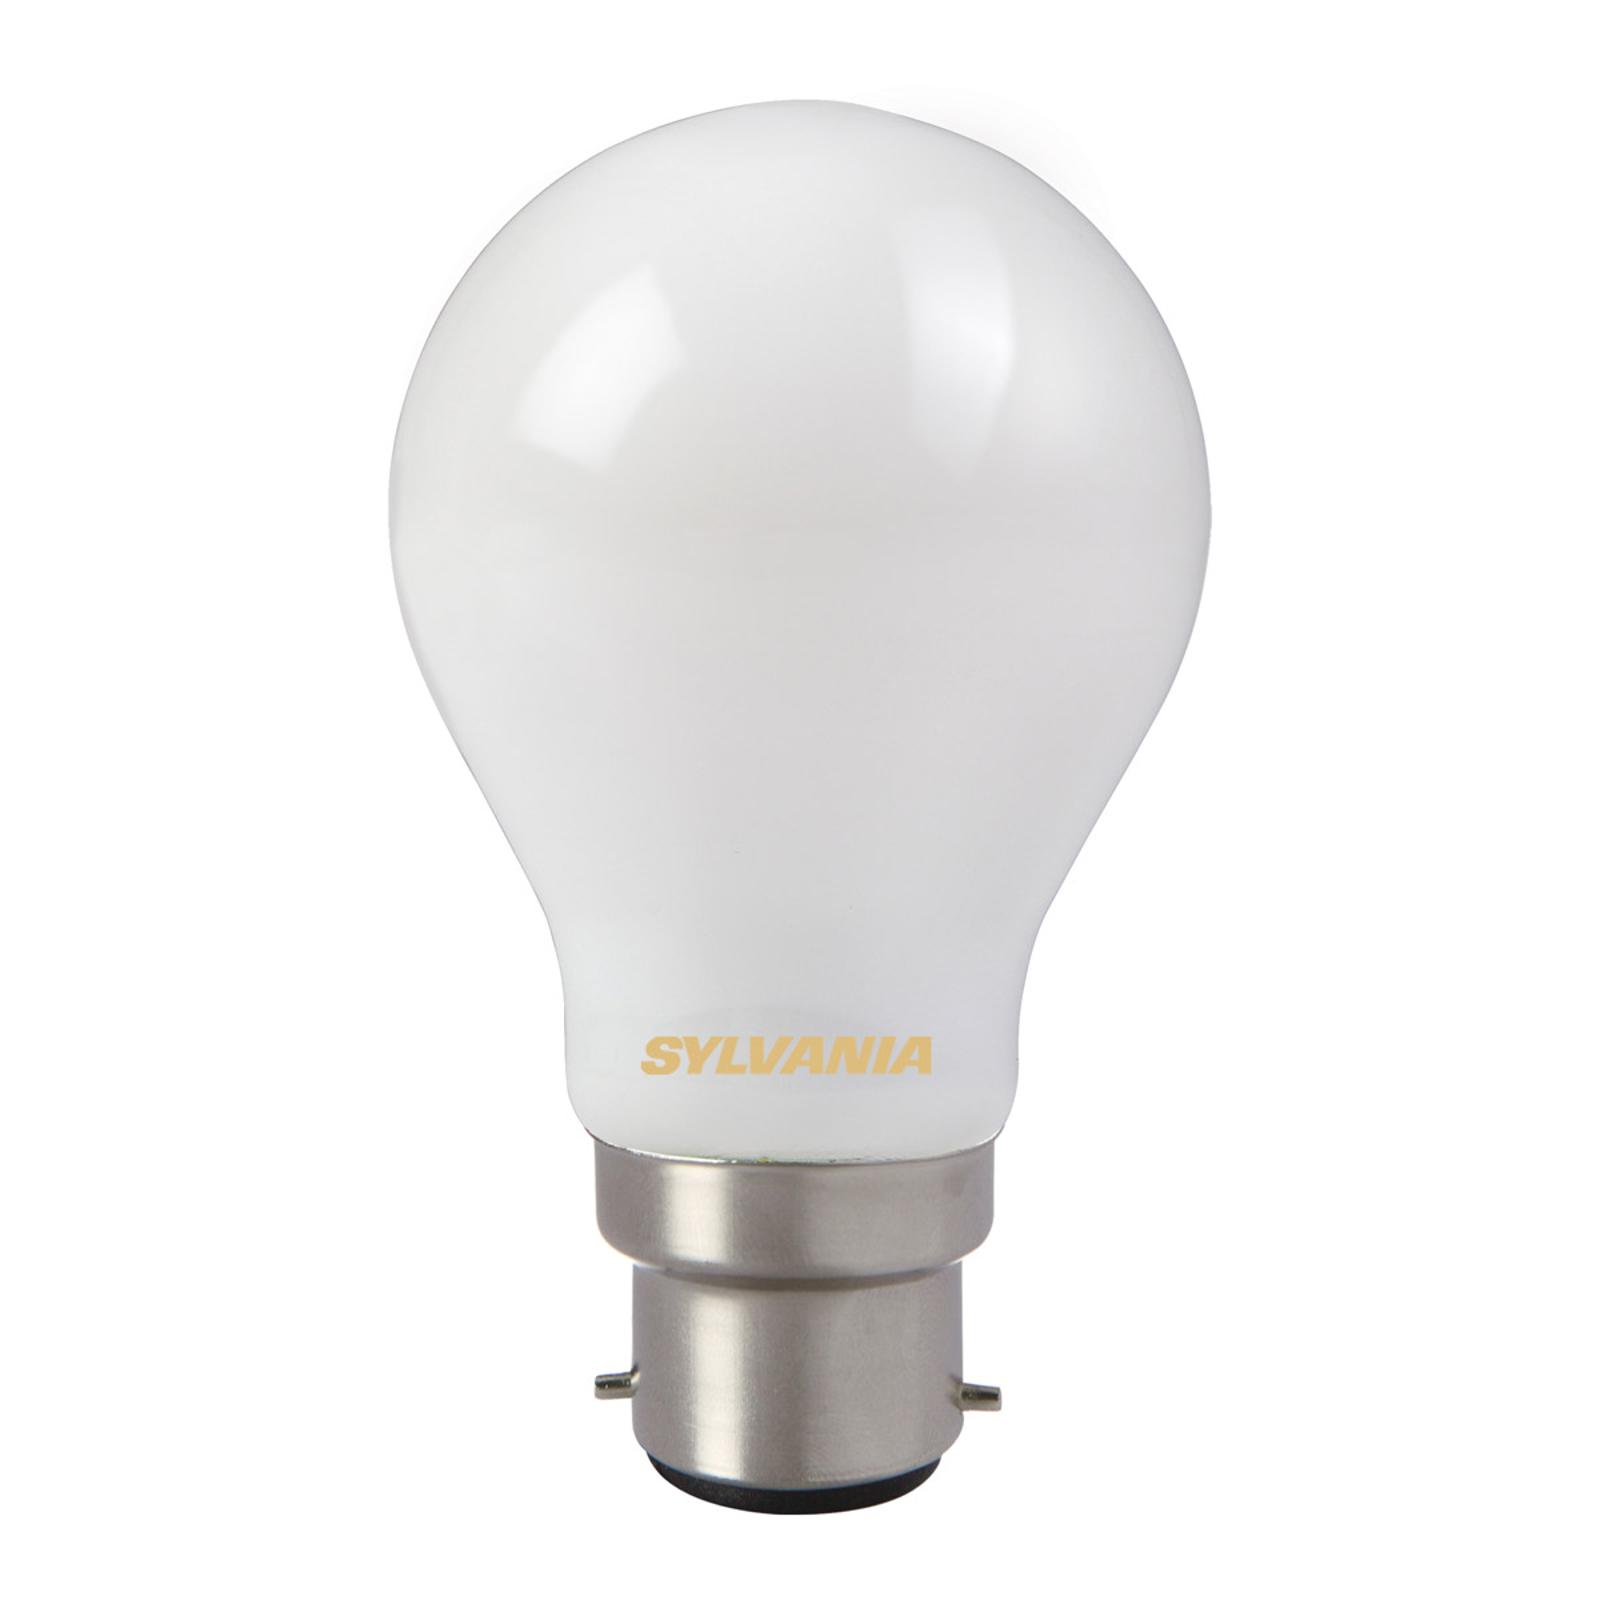 B22 7 W 827 lampa LED, satynowany